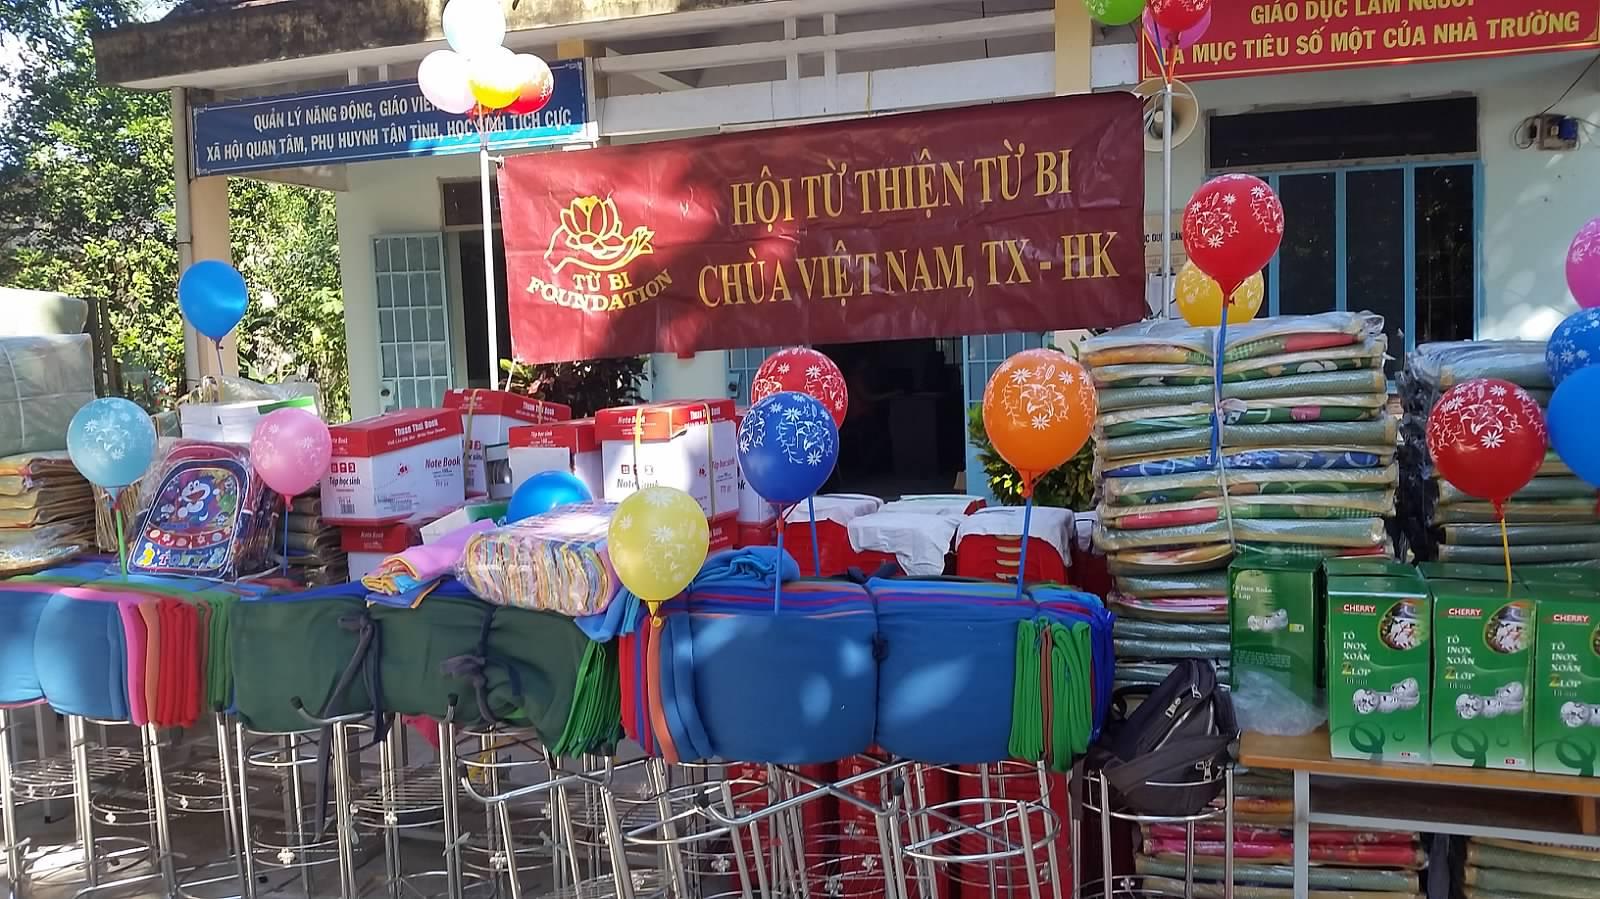 TQ Tieu Hoc Khanh Thuong 54